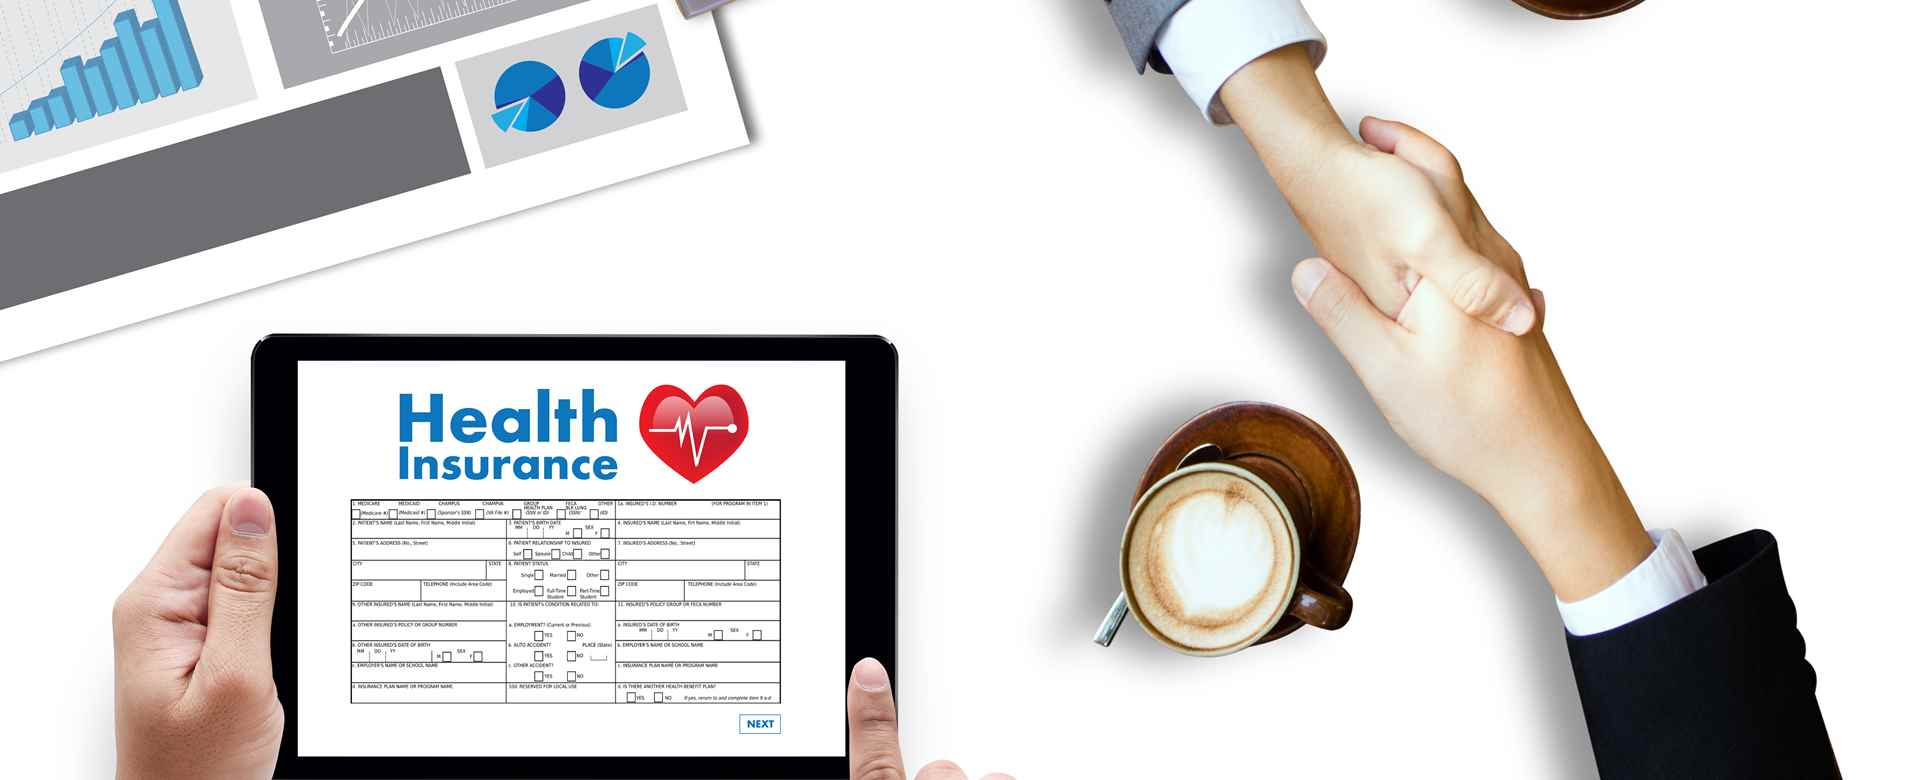 Value-Based Reimbursement and Improving Quality of Care